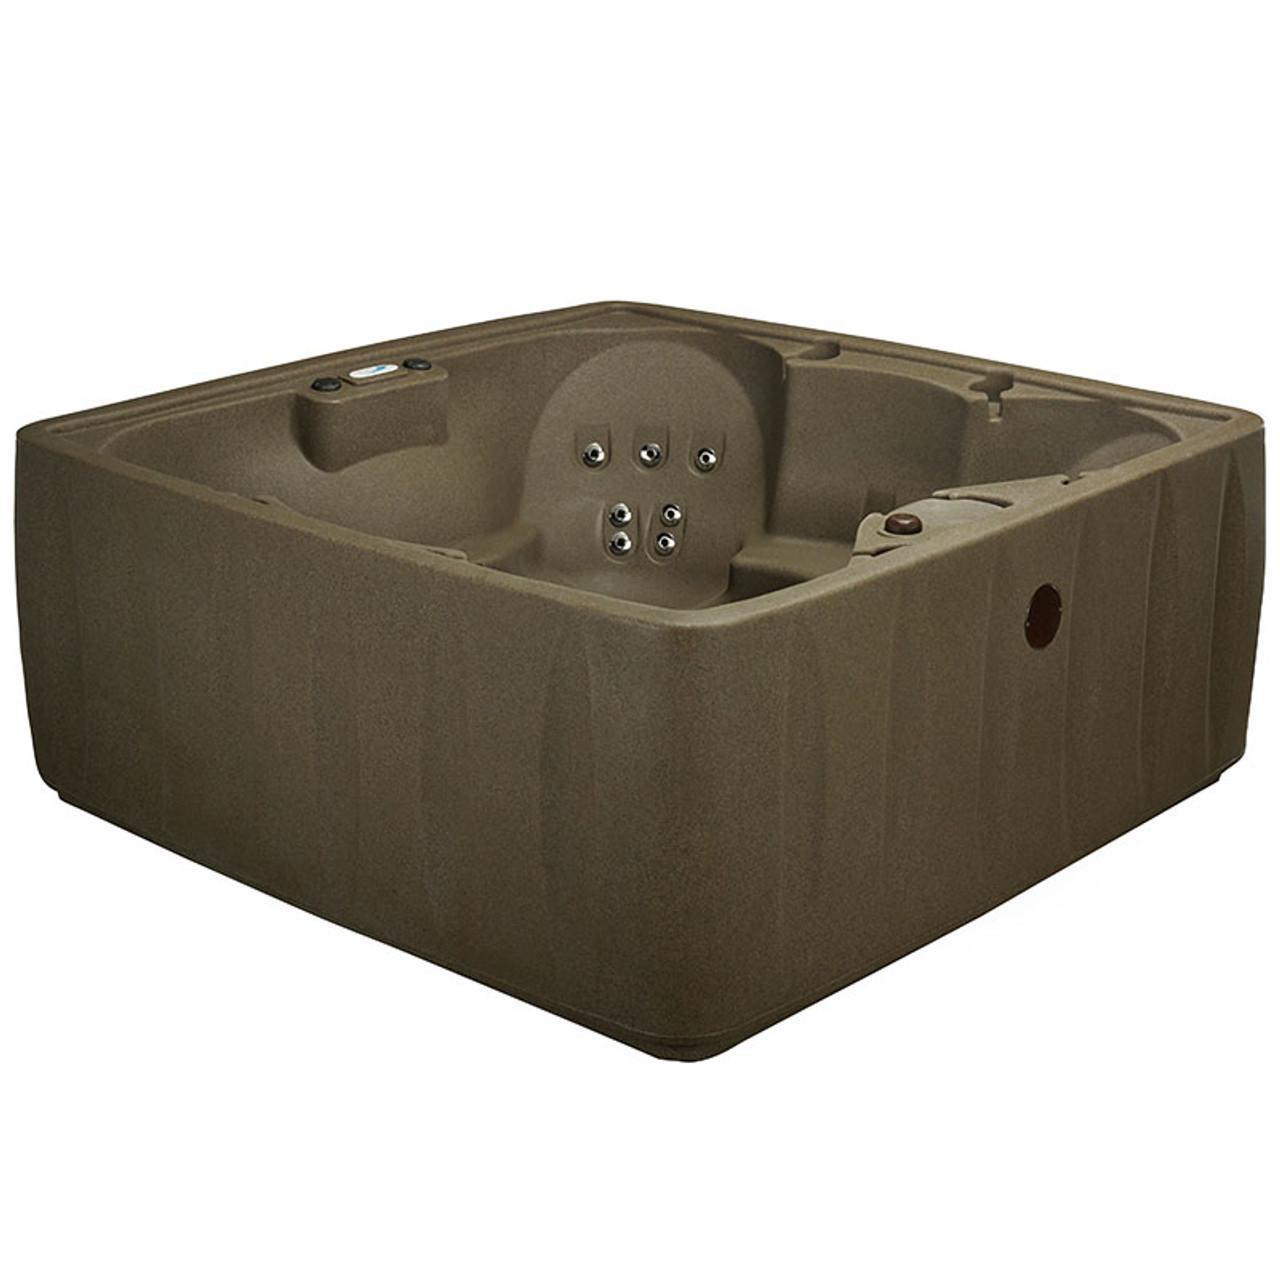 Dream Maker, AquaRest, Aqua Rest, Select 600, premium 600, AR-600, X-600, Replacement, Spa, Hot tub, Cover,, Rotational molded, Roto Mold, Leisure Bay, Rec Warehouse